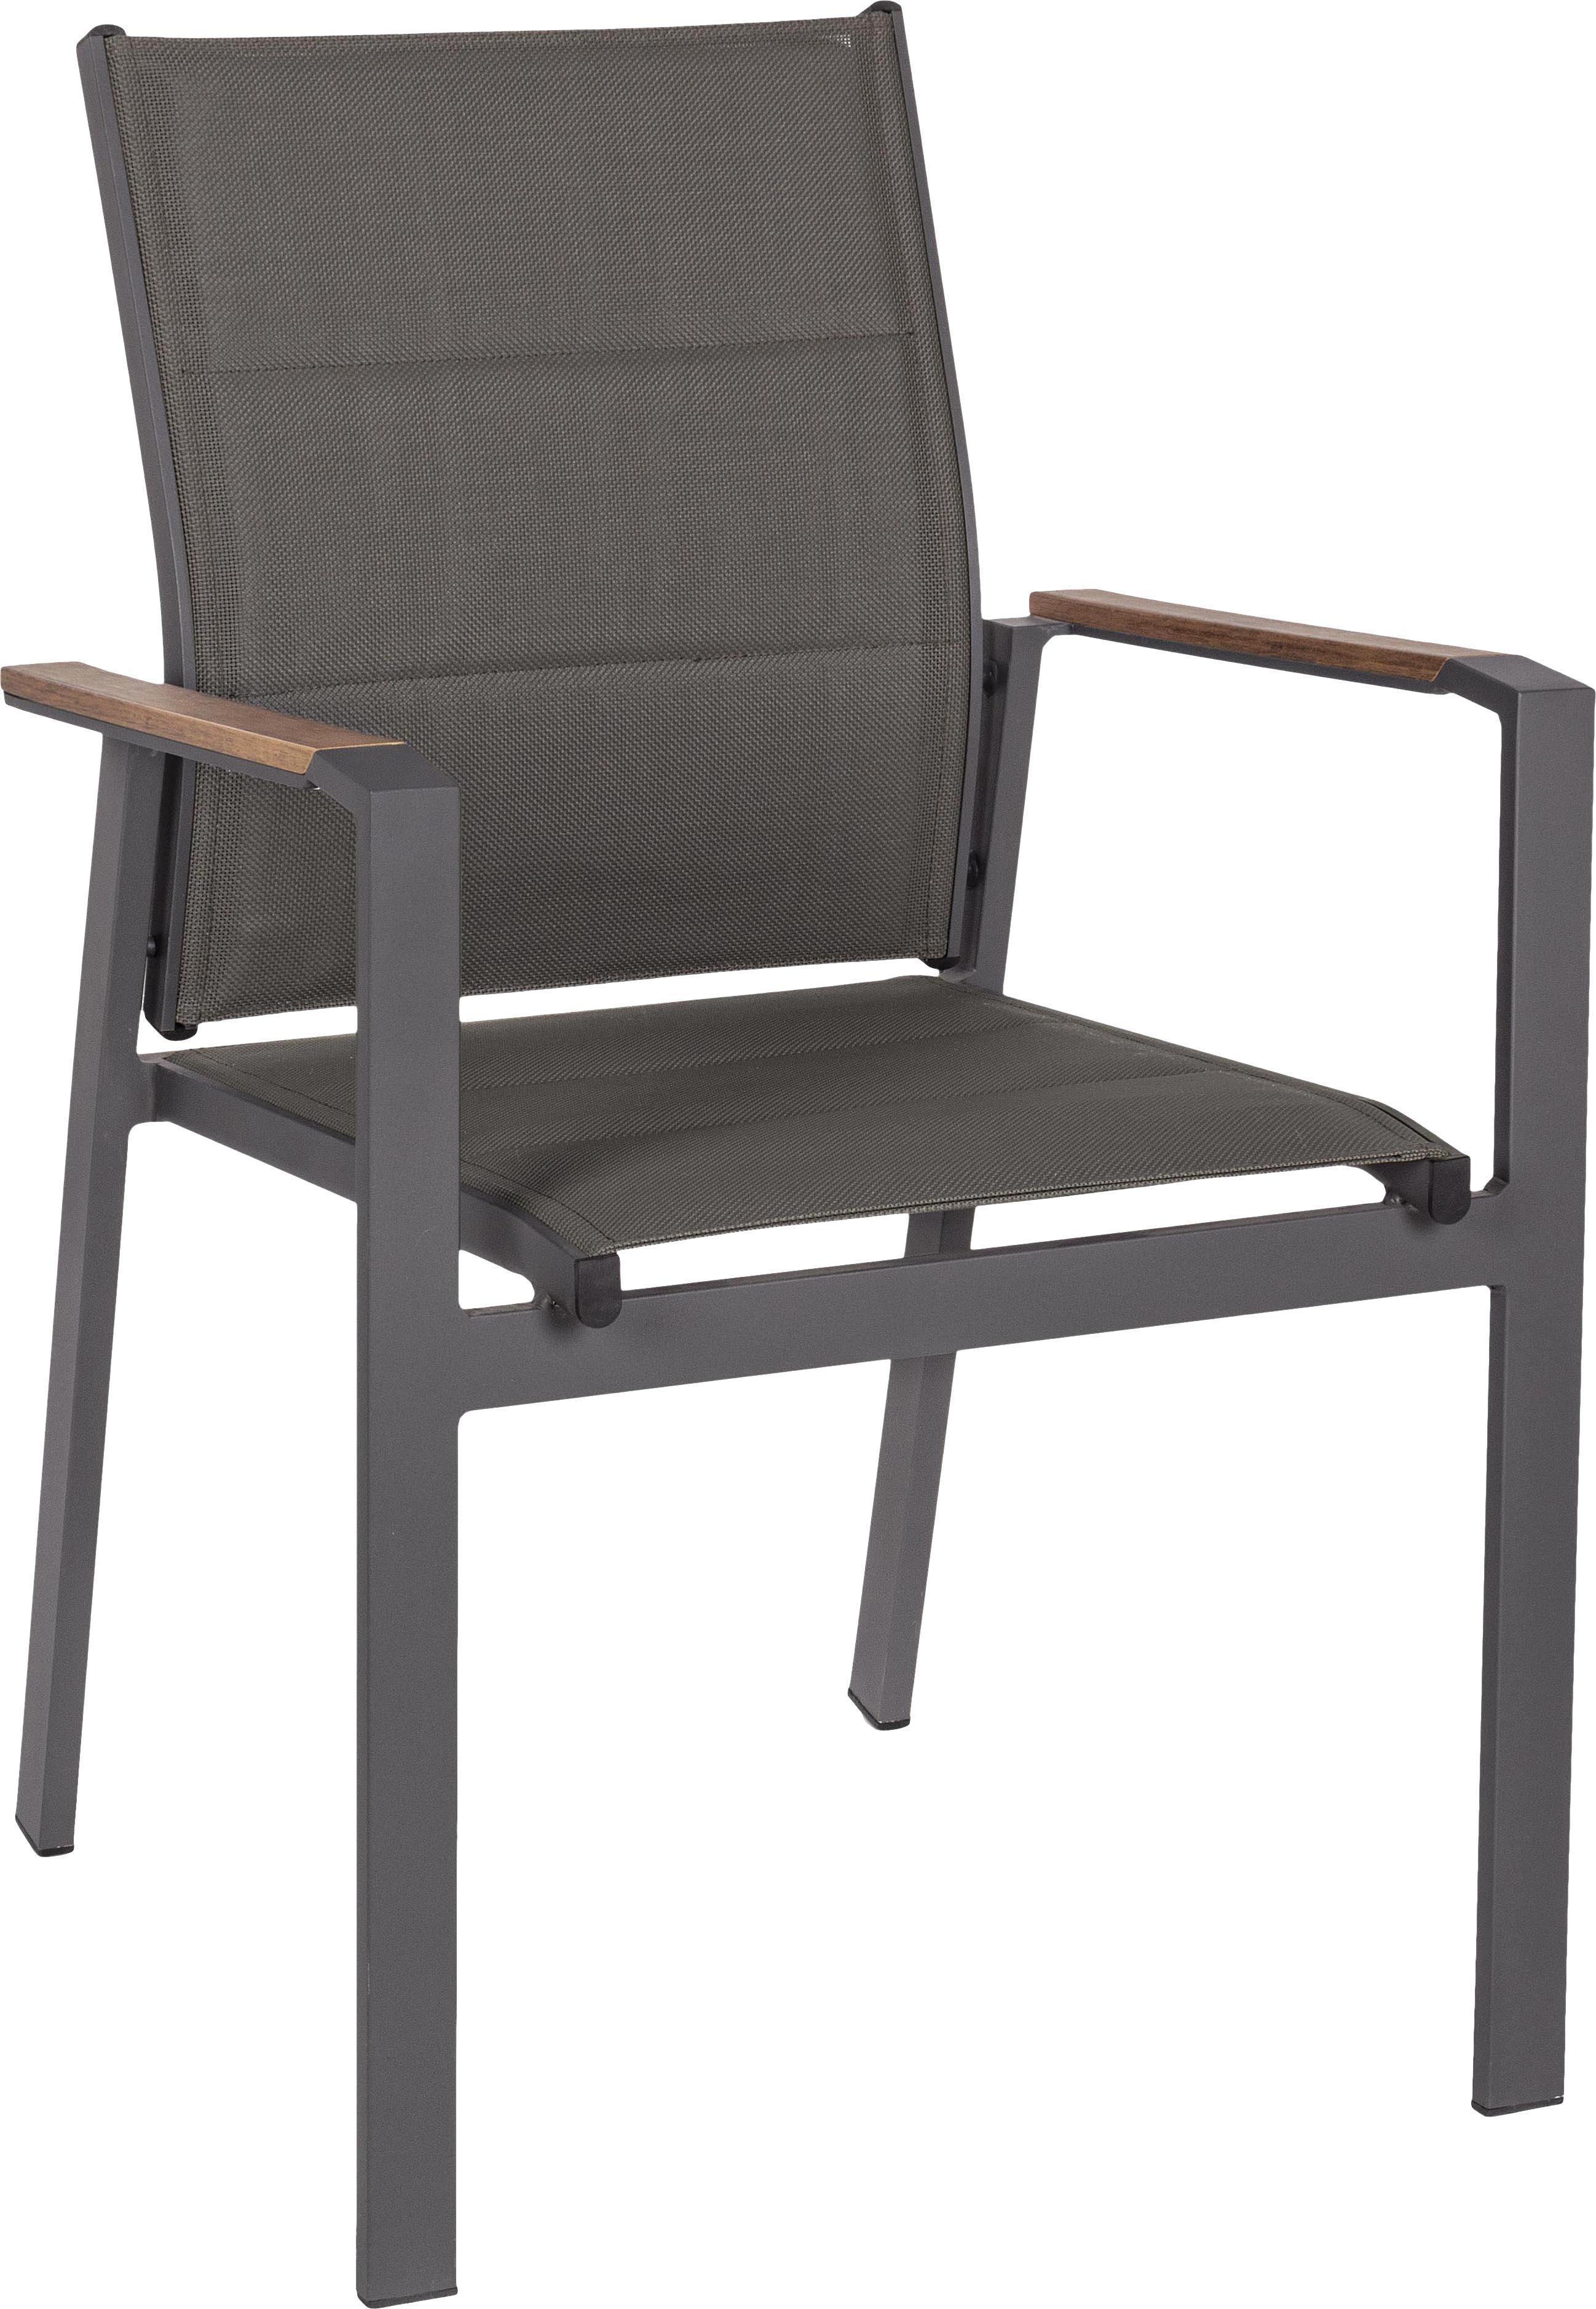 Tuinstoel Kubik, Frame: gepoedercoat aluminium, Zitvlak: Textilene, Antraciet, bruin, B 57 x D 62 cm